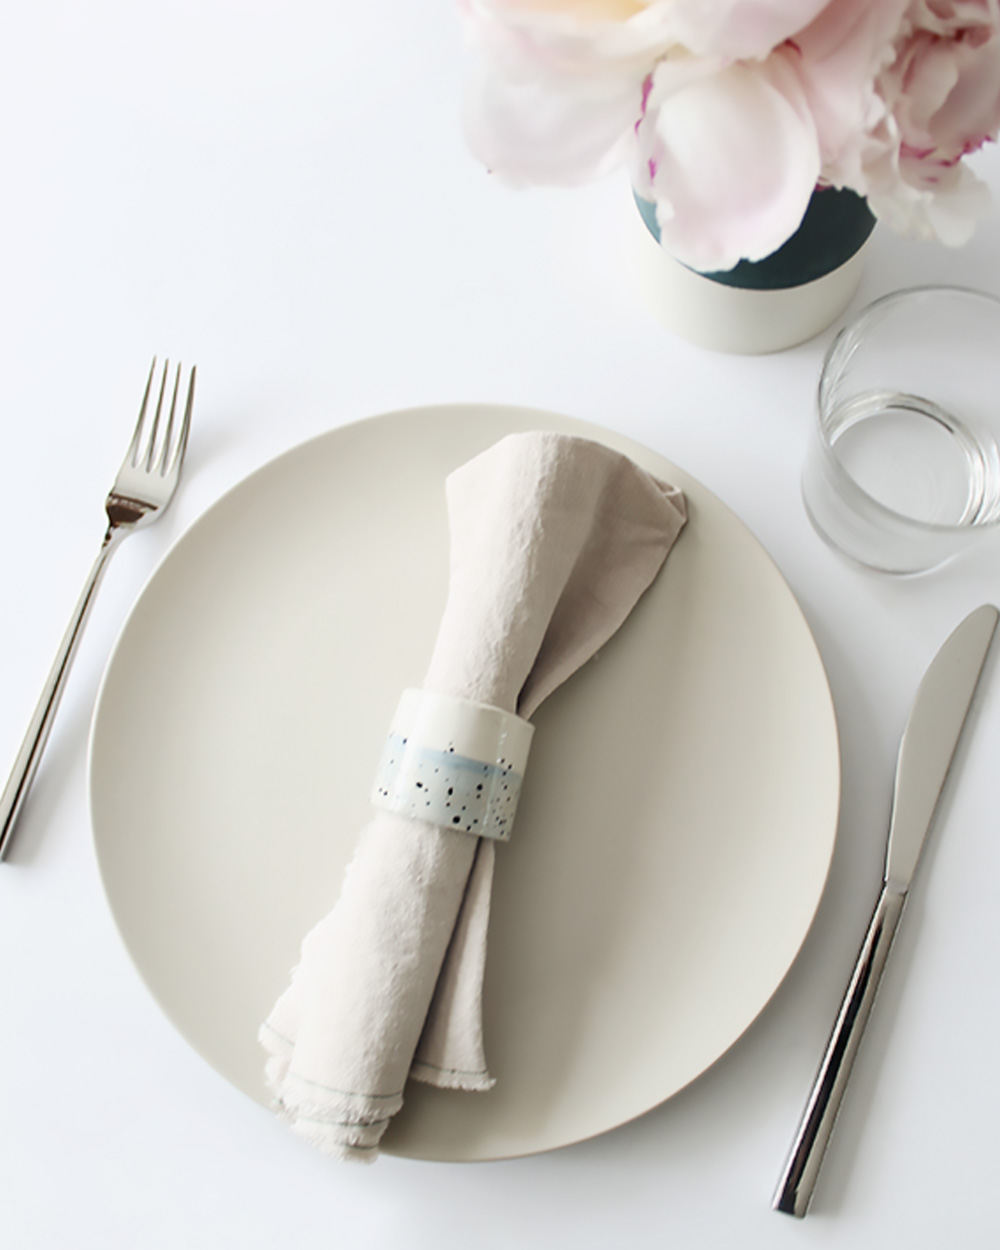 Diy Rond De Serviette un rond de serviette diy | shake my blog